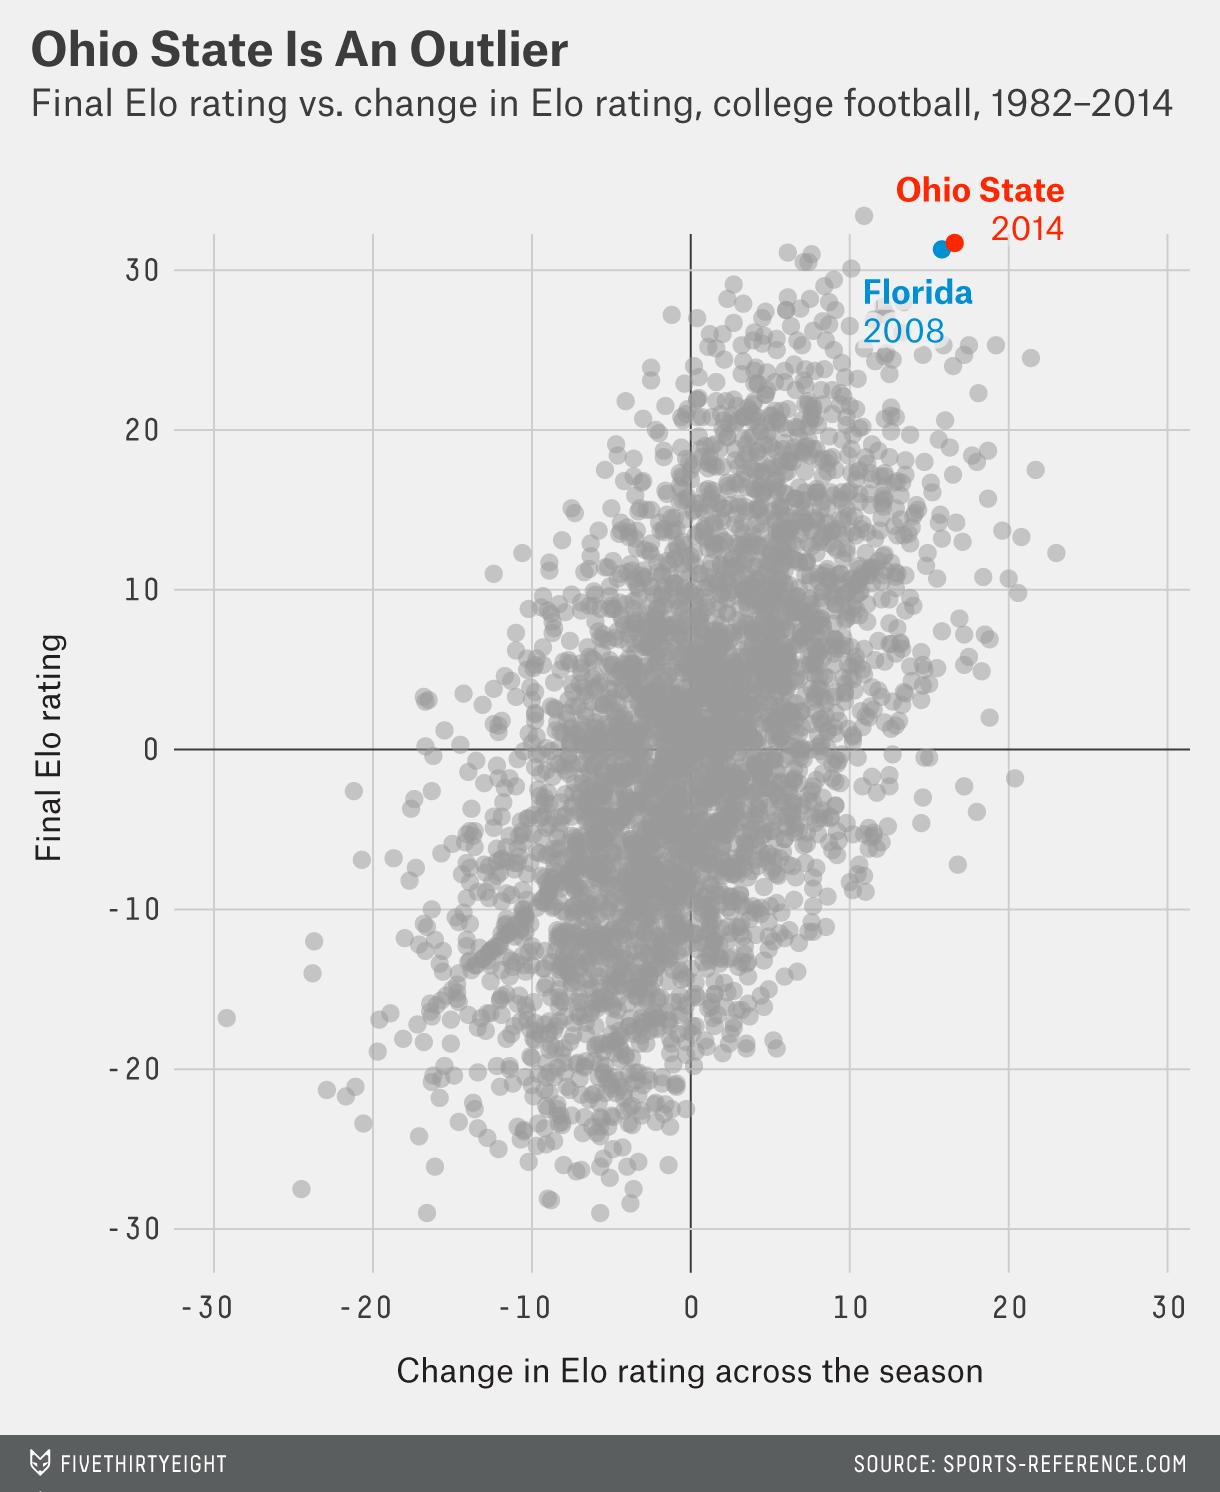 flowers-datalab-ohio-state-crazy-1